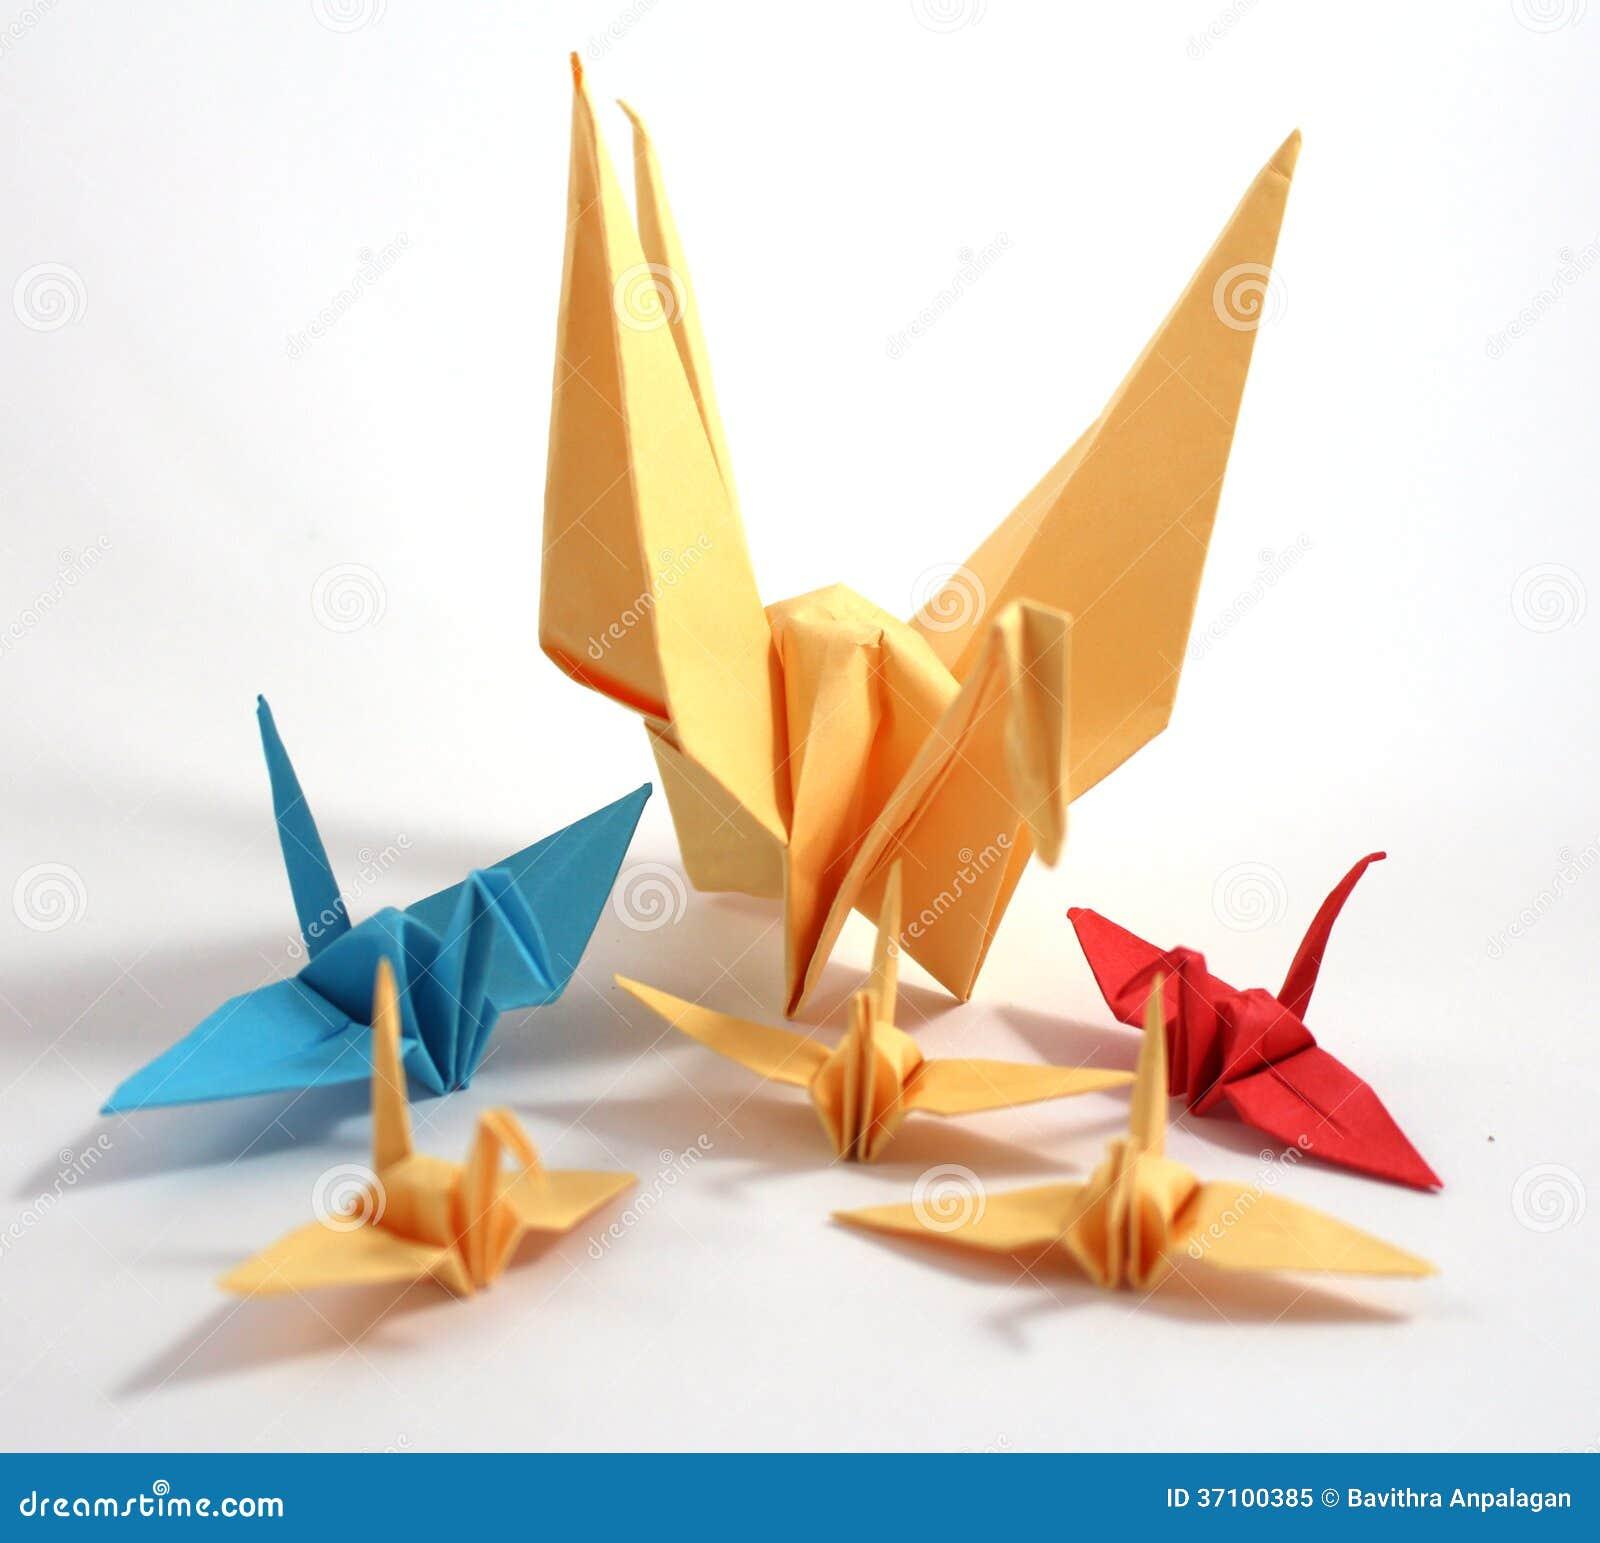 Origami Swan Royalty Free Stock Photo - Image: 37100385 - photo#9